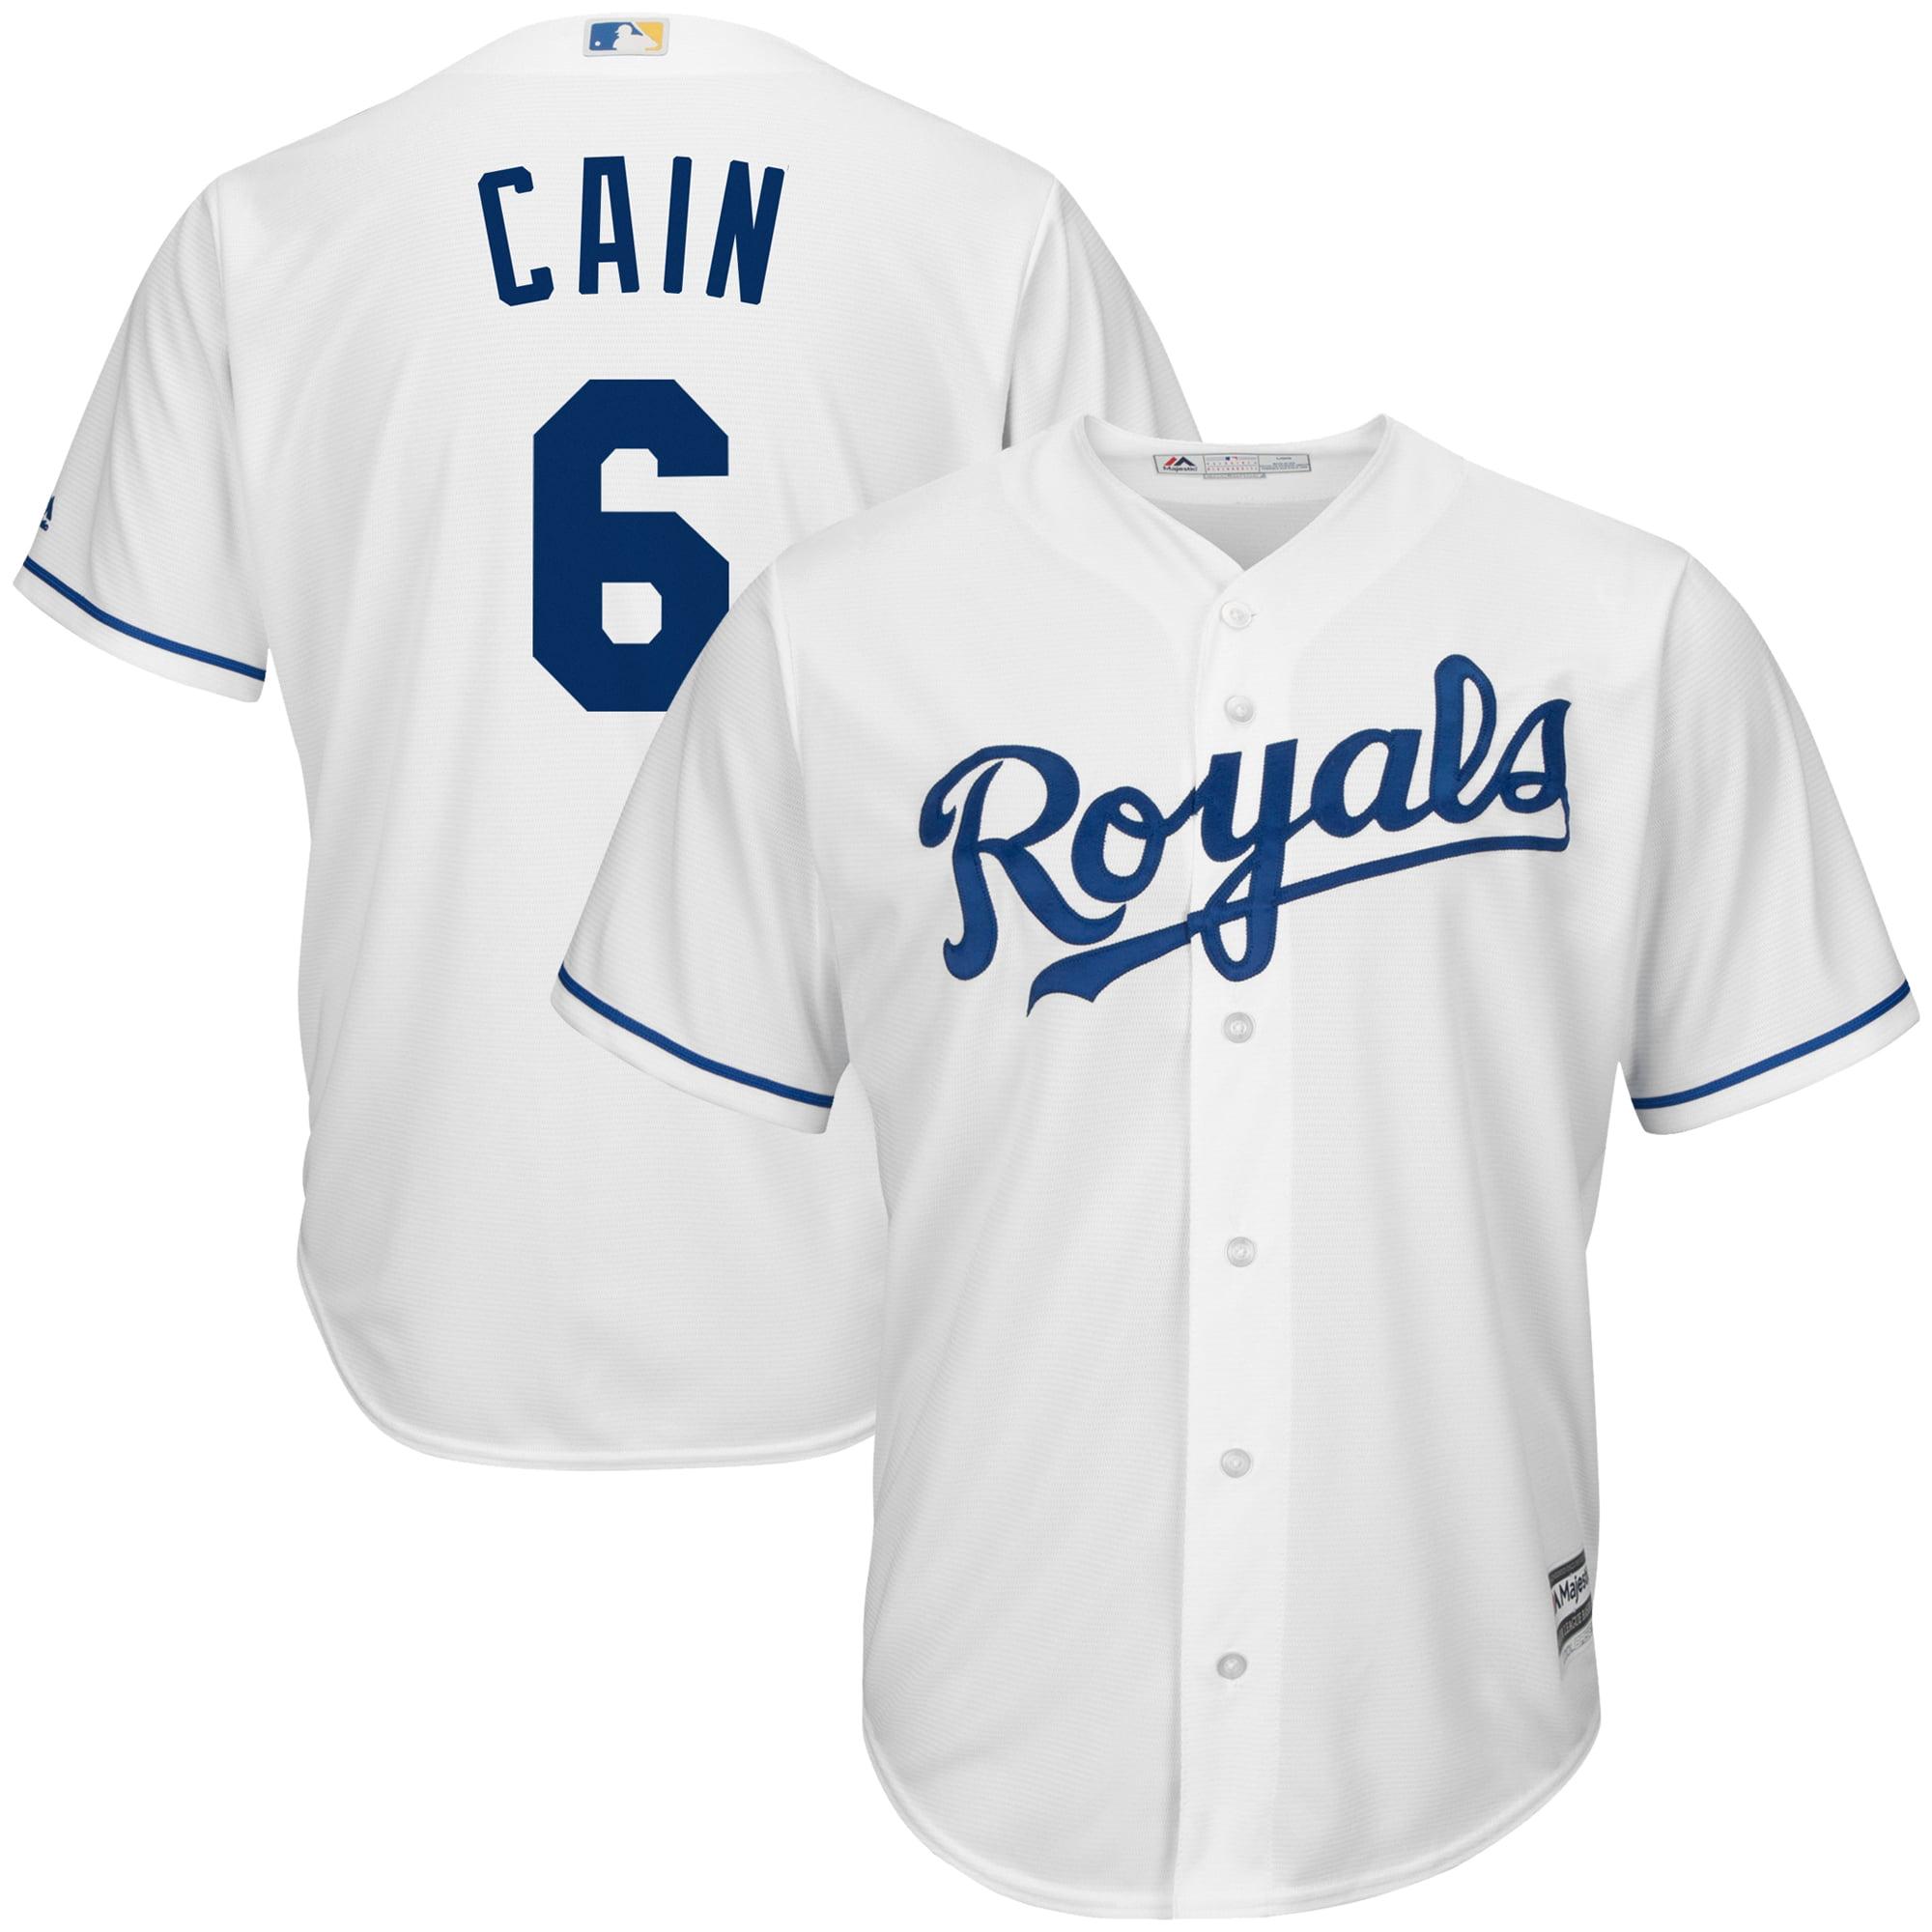 Men's Majestic Lorenzo Cain White Kansas City Royals Big & Tall Official Cool Base Player Jersey